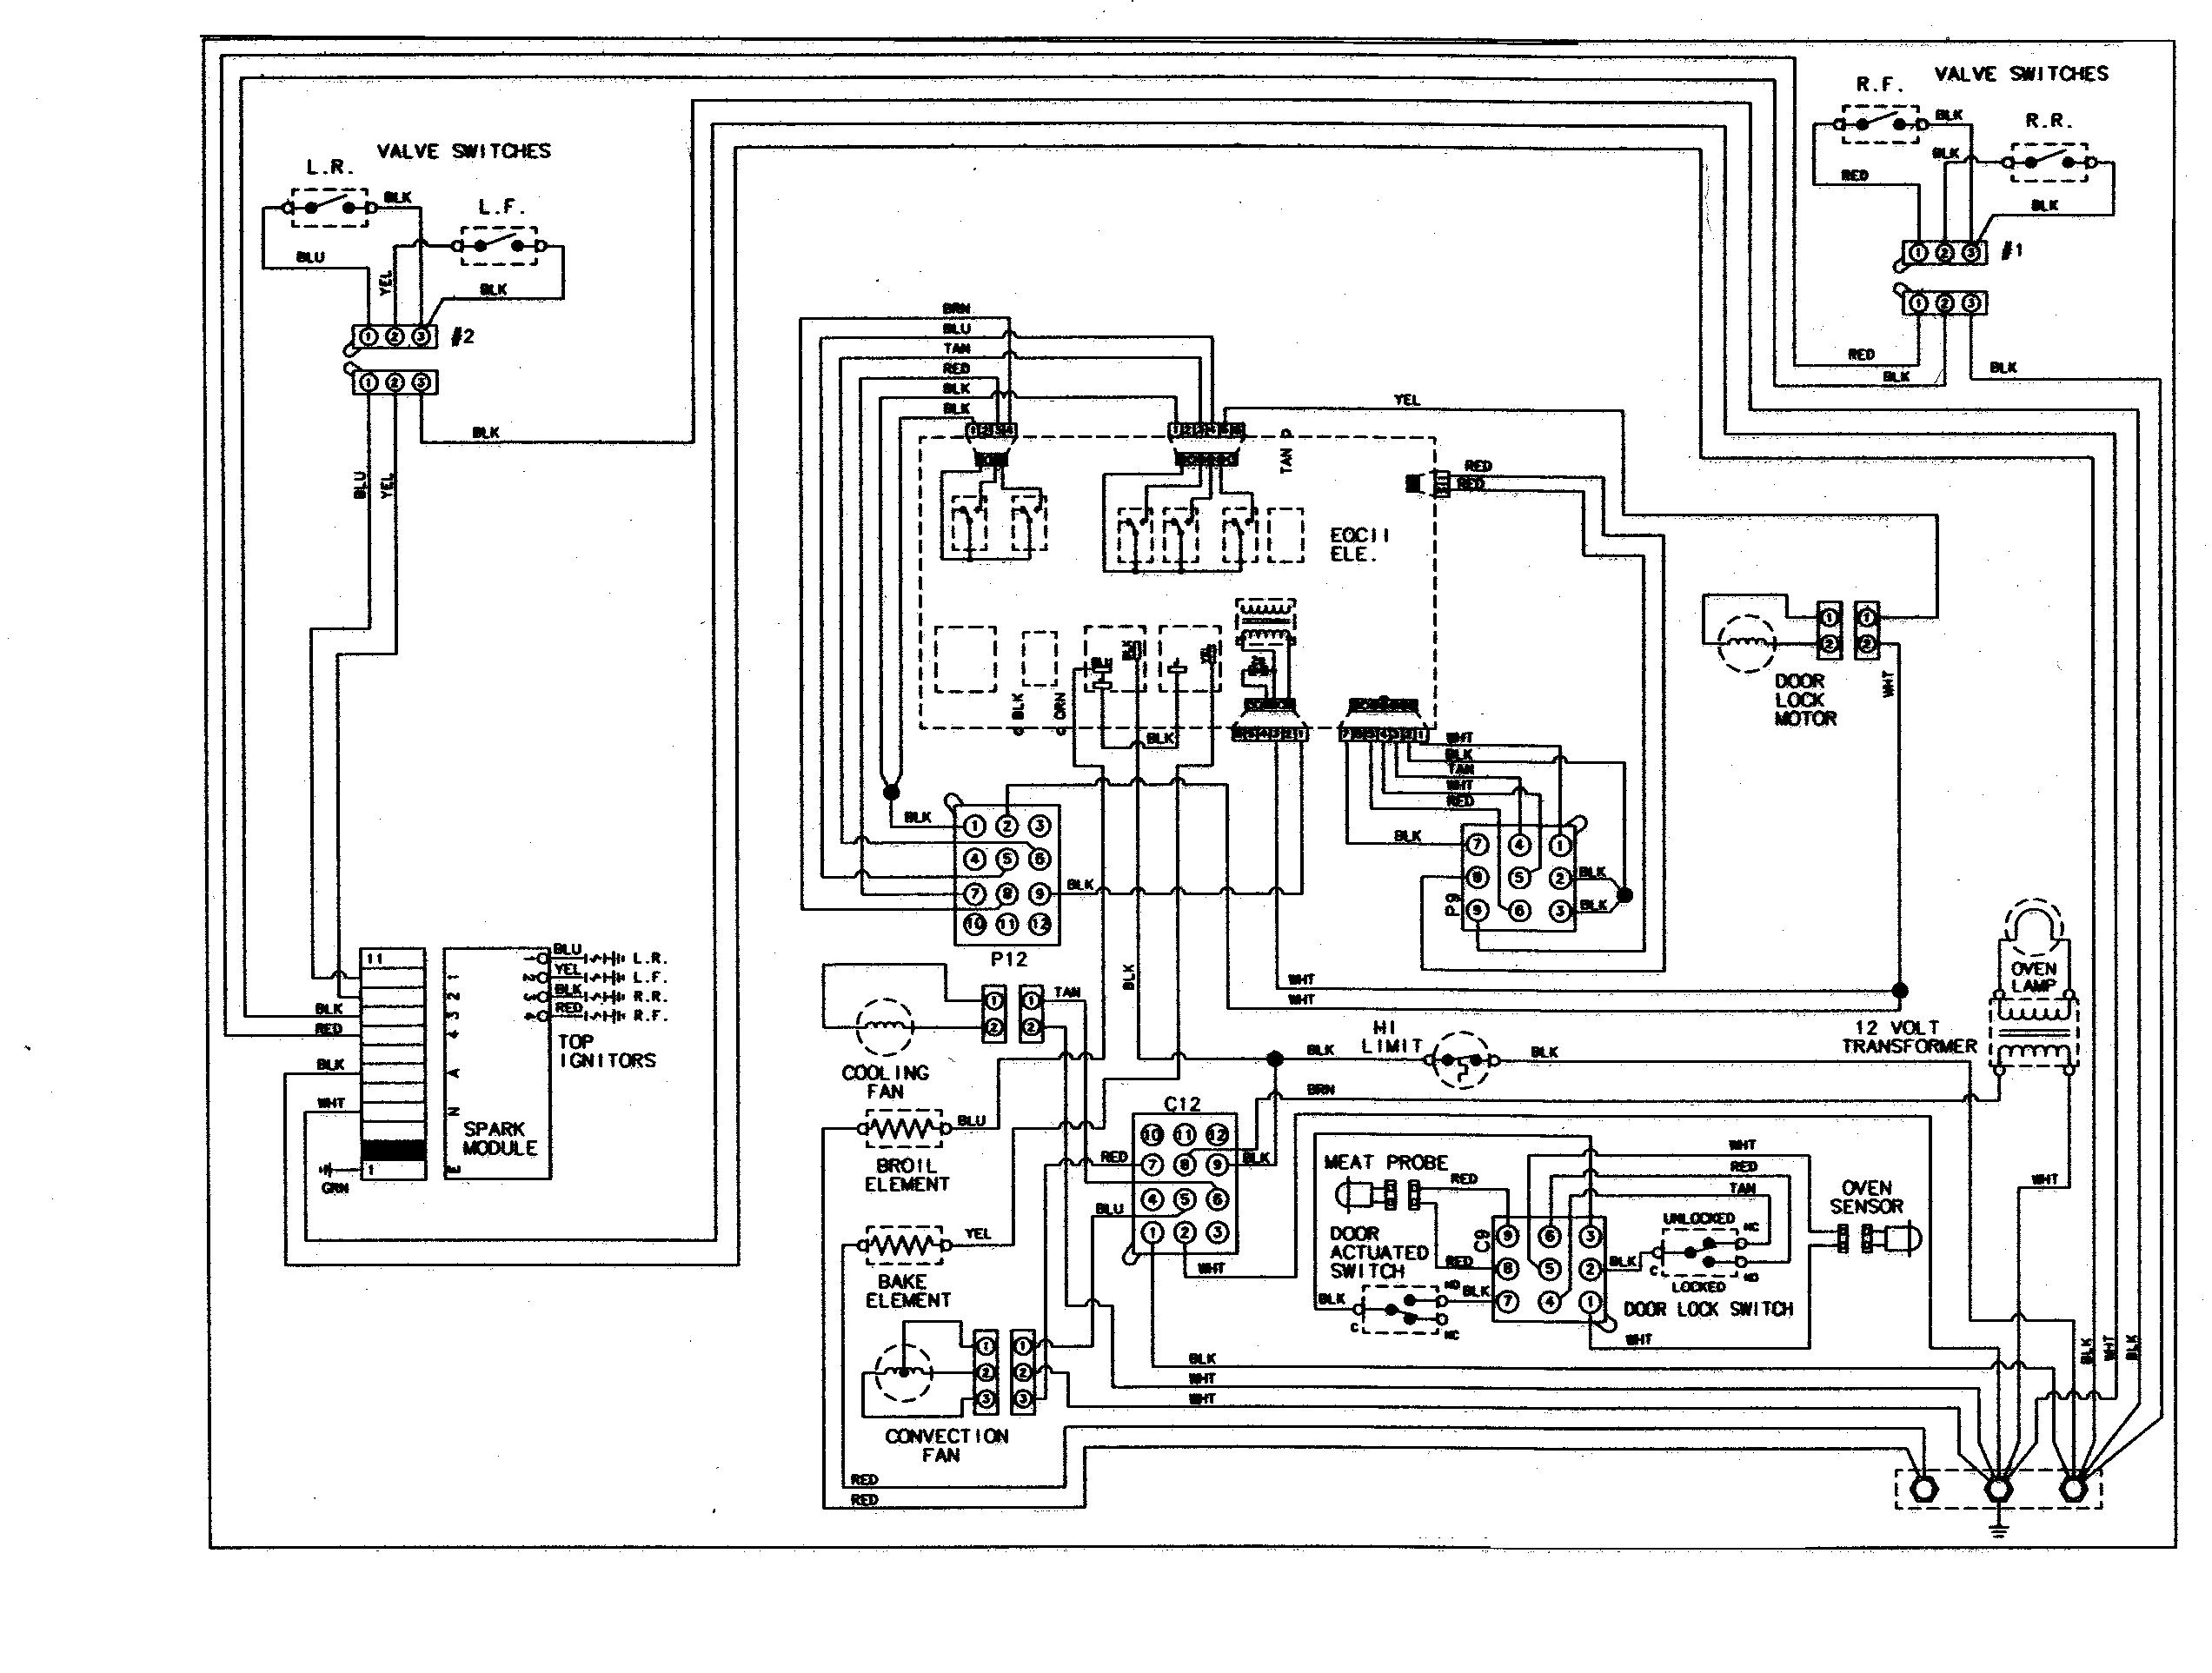 Defrost Timer 8145 00 Wiring Diagram On Defrost Download Wirning ...